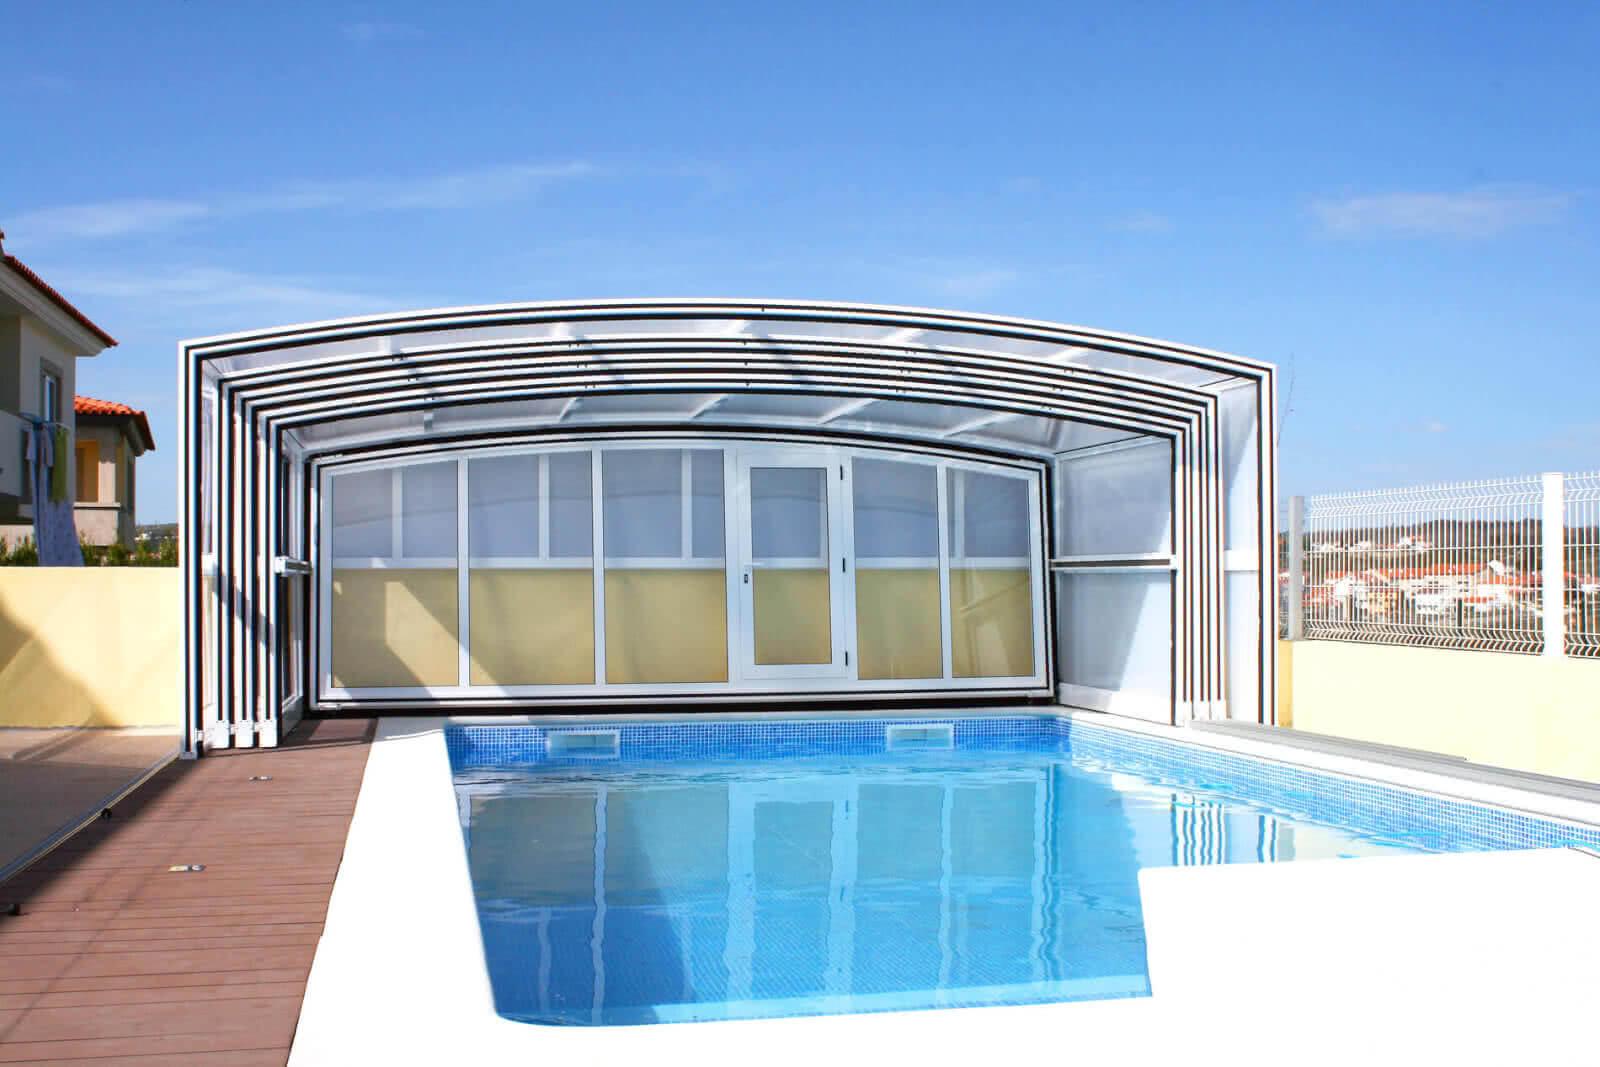 Fabricantes de cubiertas de piscinas en andaluc a for Piscinas cubiertas salamanca